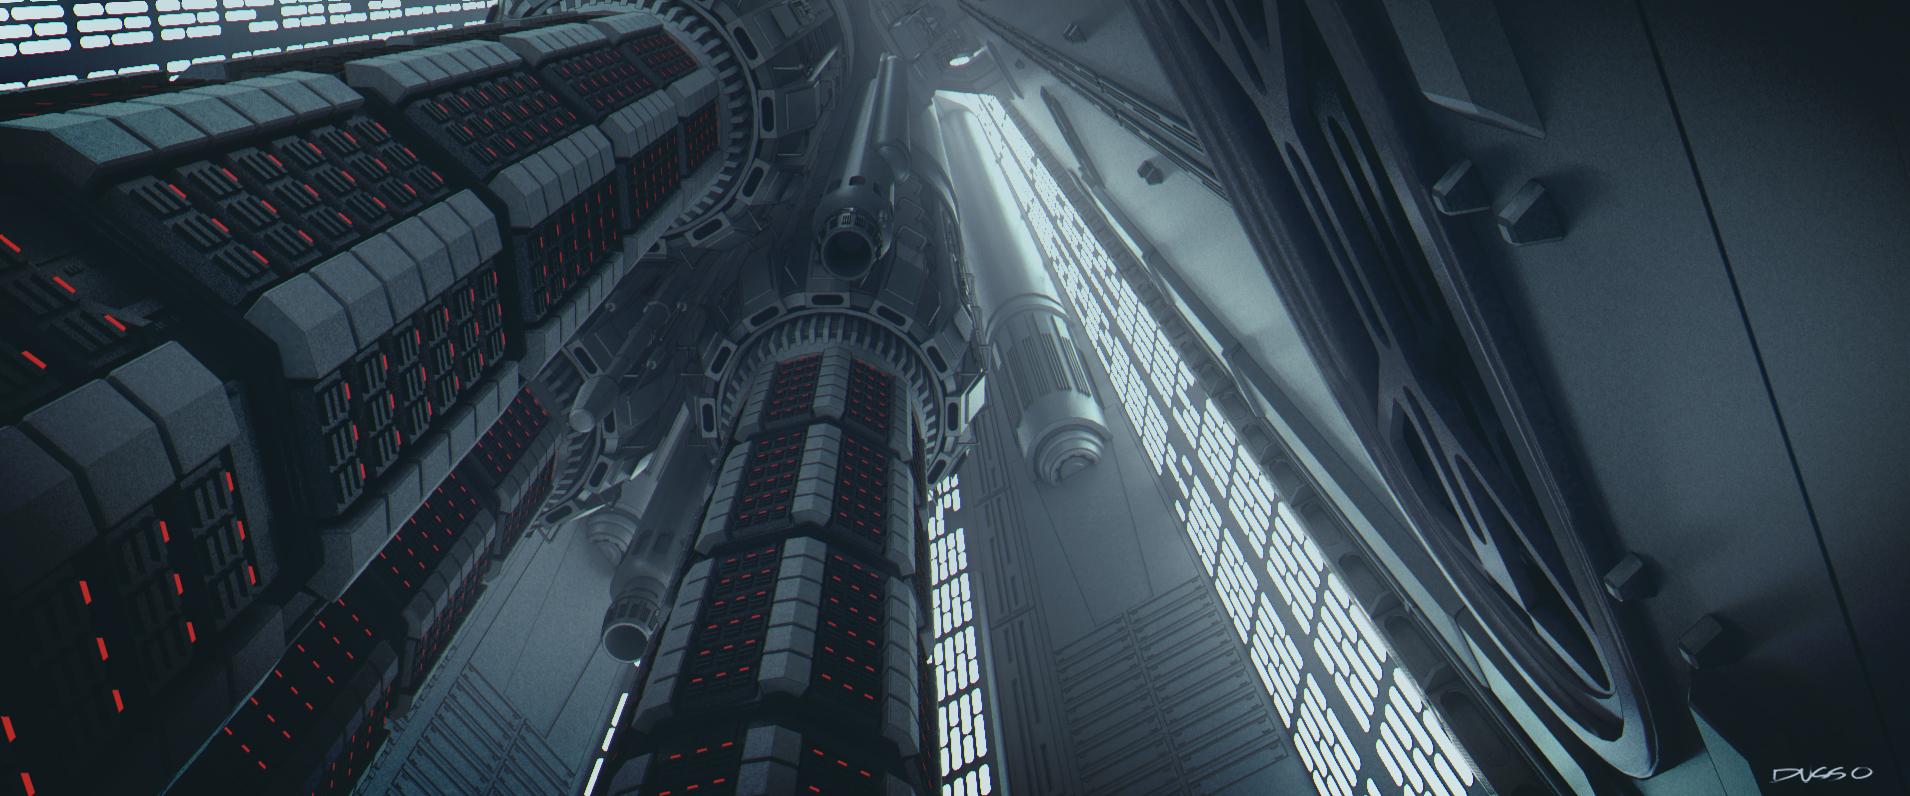 concept-art-dusseault-elevator